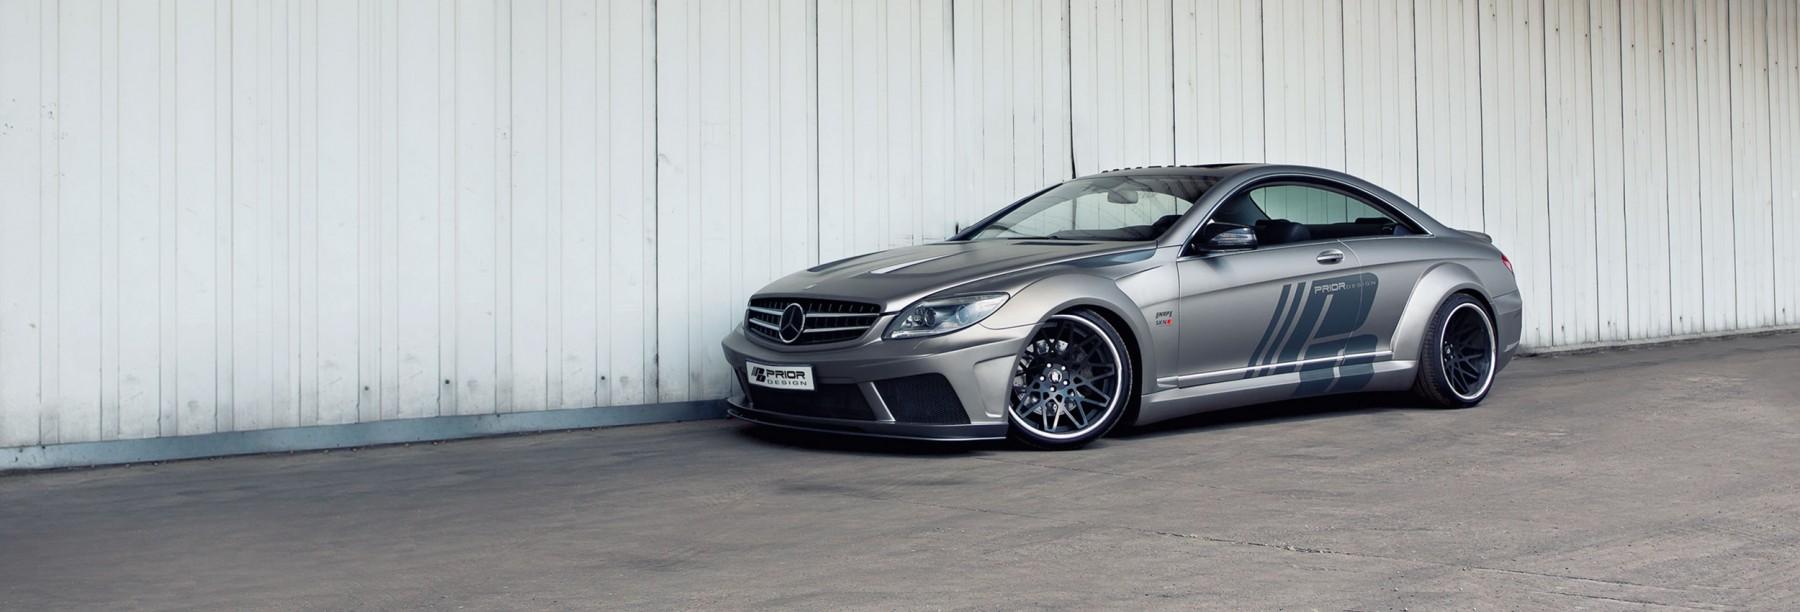 PD Black Edition V2 Widebody Аэродинамический комплект для Mercedes CL [W216]